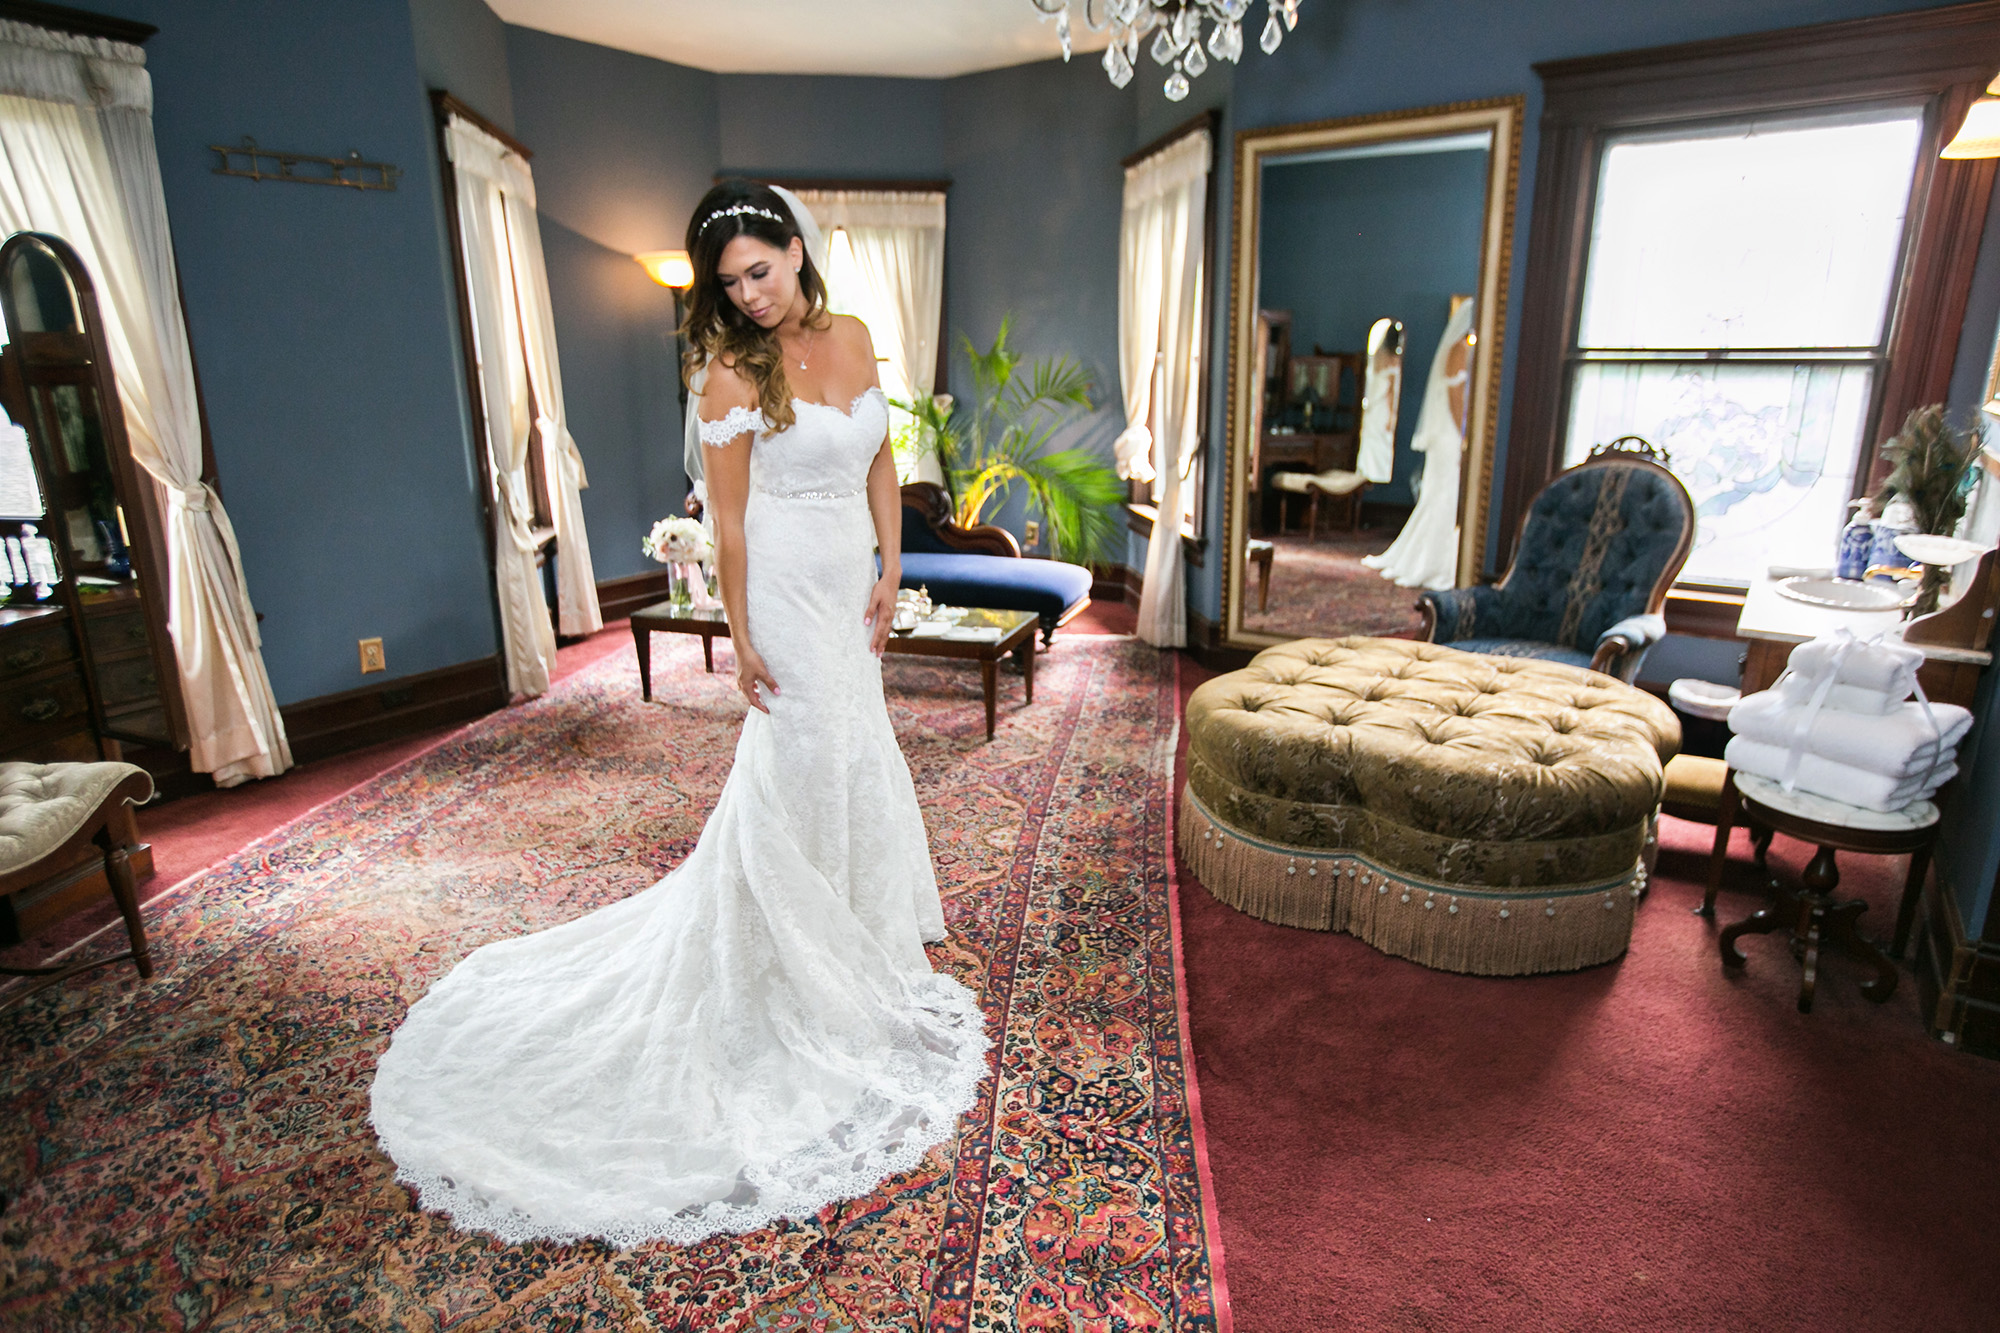 christmas-house-weddings-receptions-carrie-vines-108.jpg